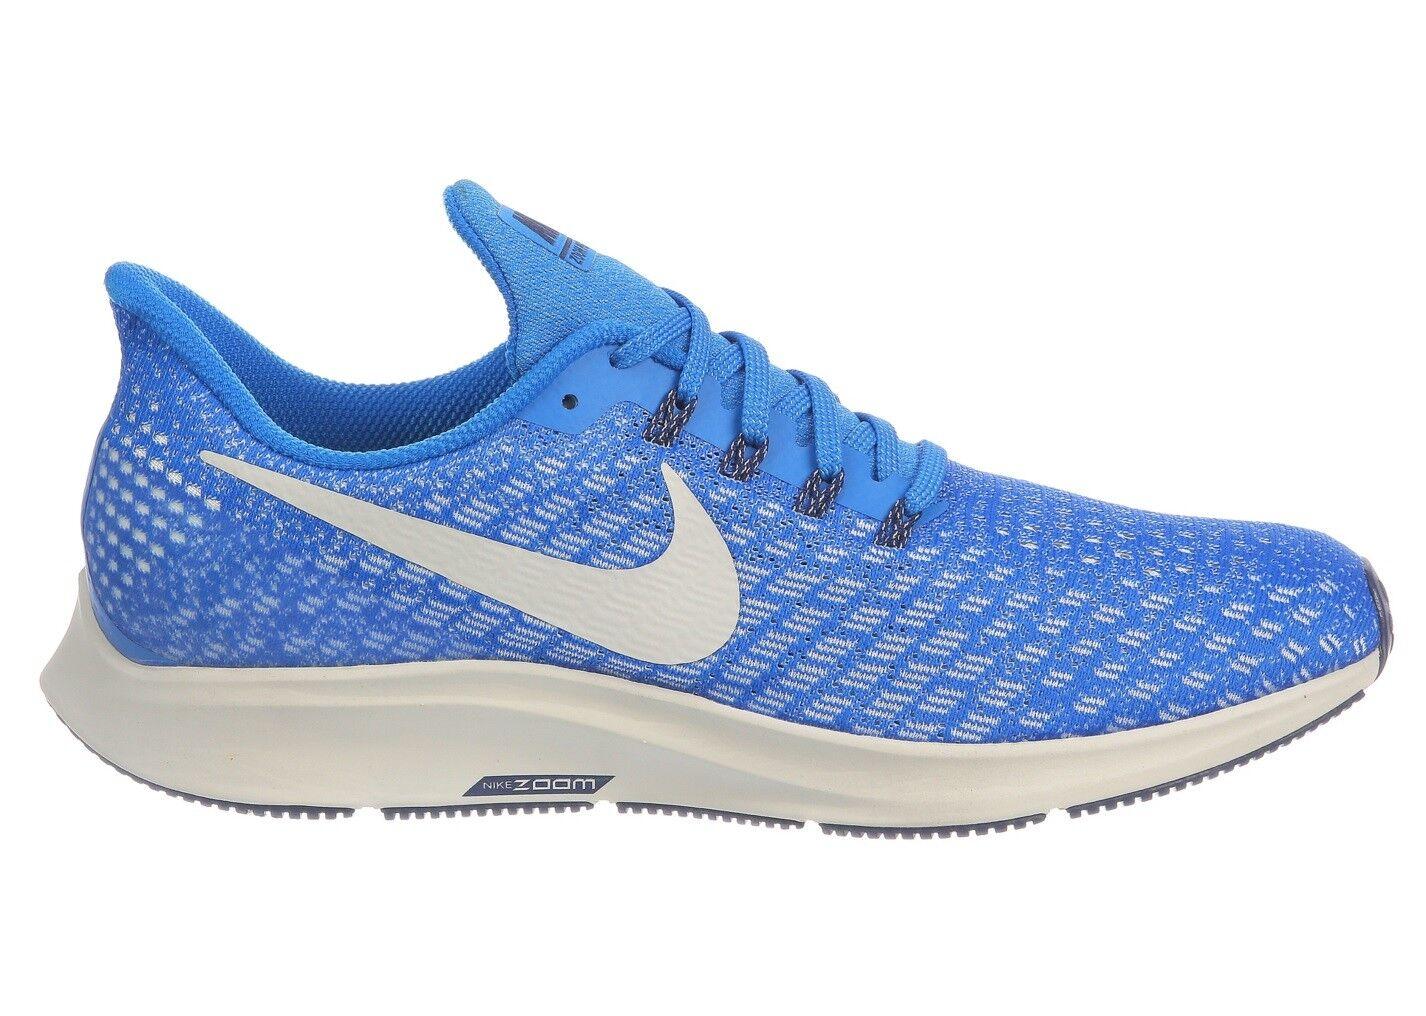 Nike air zoom scarpe pegasus 35 uomini 942851-402 cobalto blaze scarpe zoom taglia 8,5 b40dfc